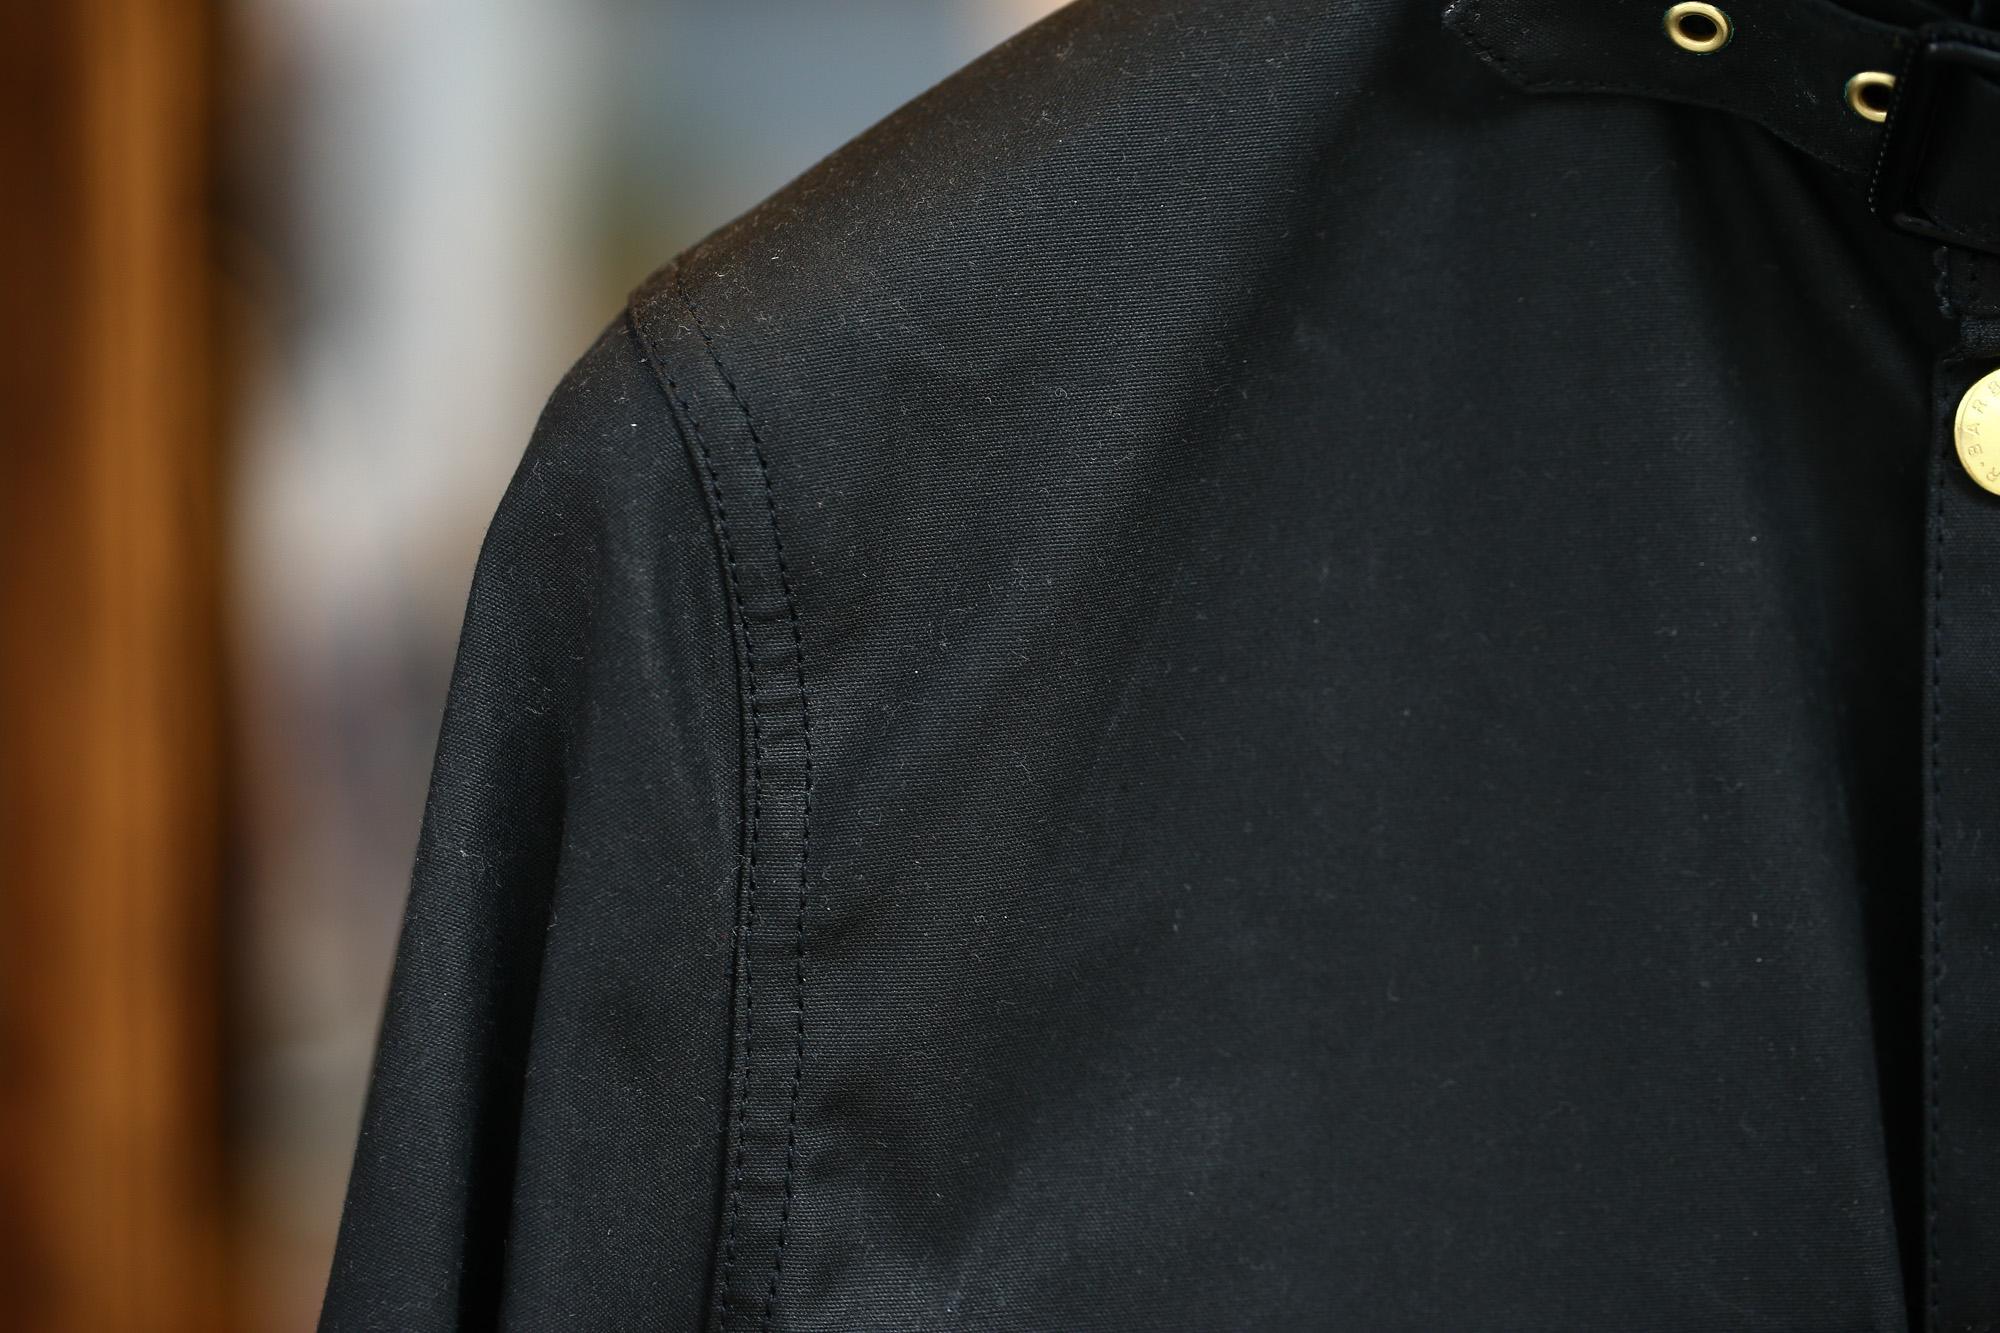 Barbour (バブアー) INTERNATIONAL JACKET SL (インターナショナル ジャケット エスエル) ワックスコットン オイルドコットン スリムフィット オイルドジャケット BLACK (ブラック・BK11) Made in England (英国製) 2016 秋冬新作 愛知 名古屋ZODIAC ゾディアック バブワー バヴアー 32,34,36,38,40,42